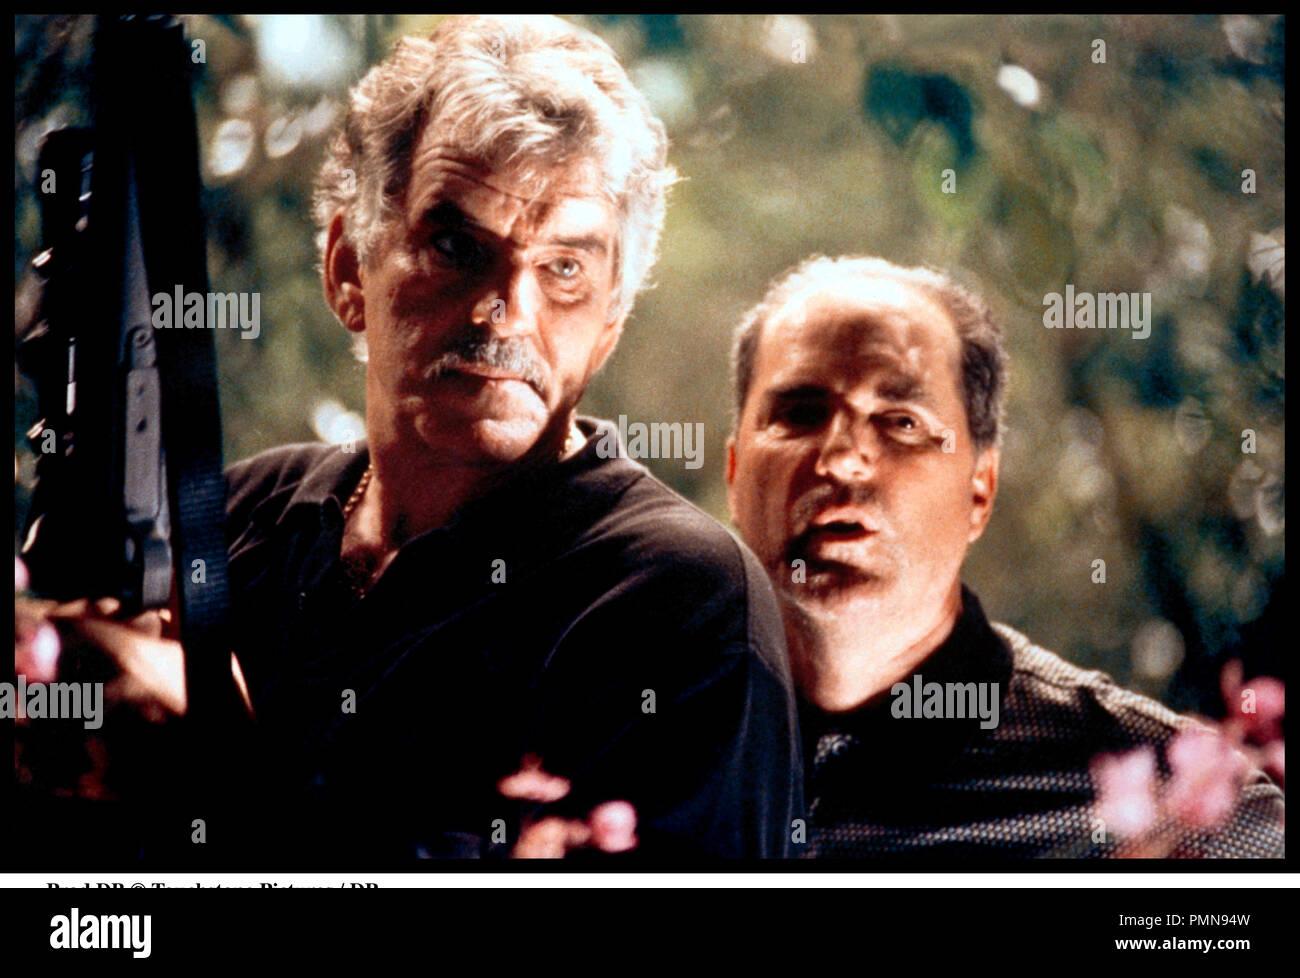 big trouble (2002 film)